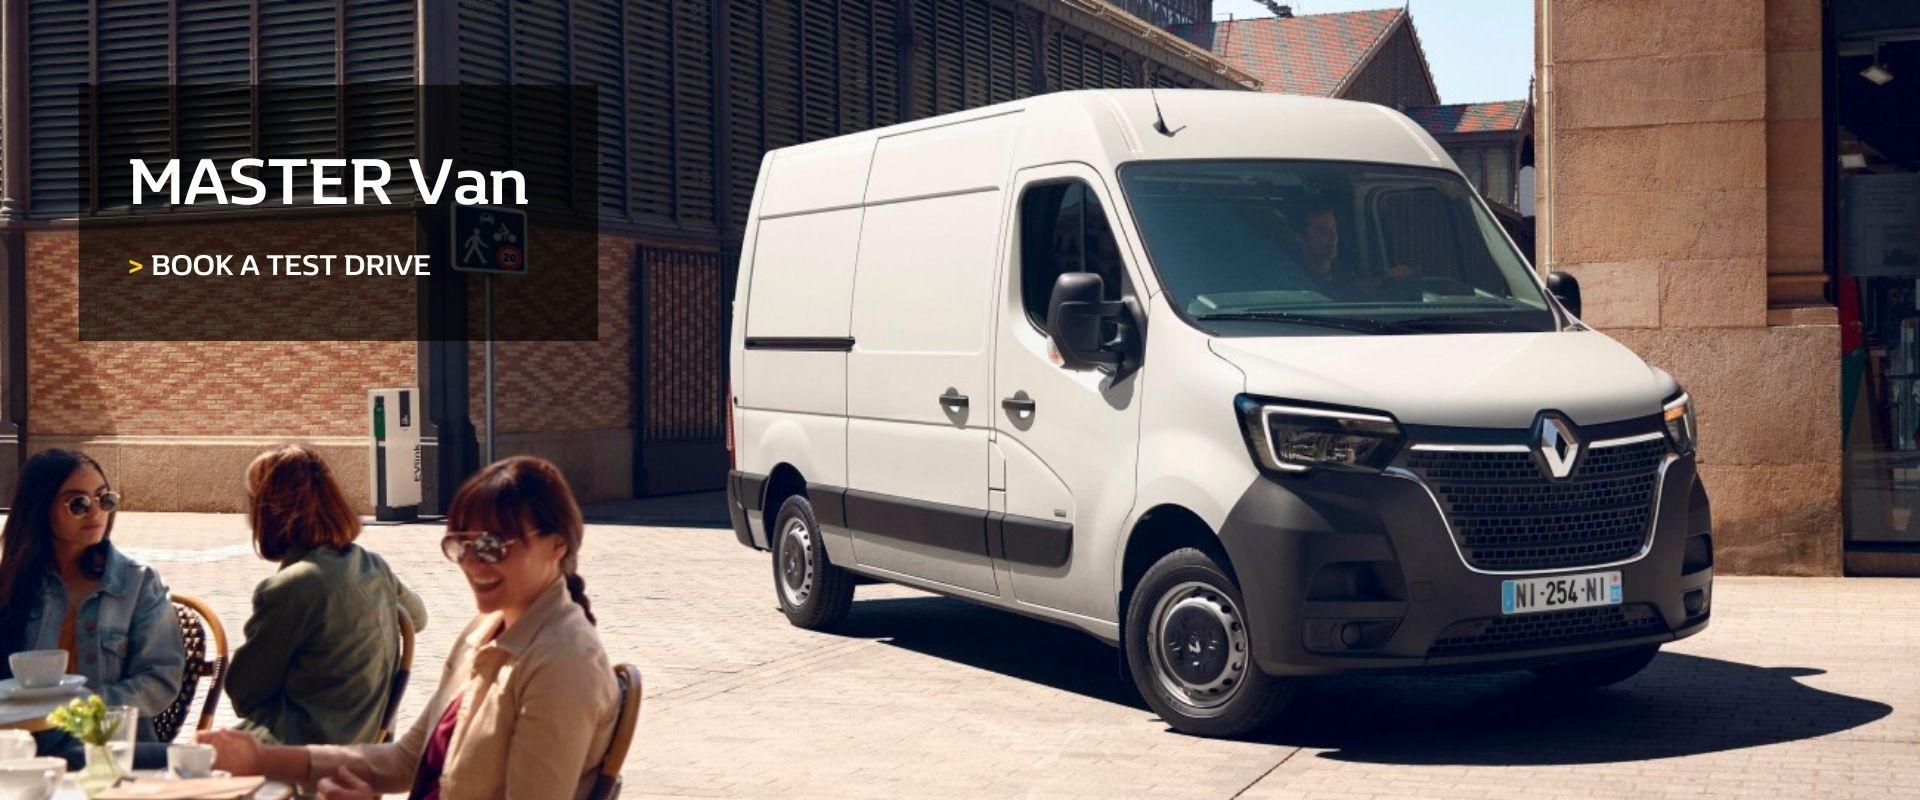 Renault Master Van -  Book a test drive today at Cricks Maroochydore Renault